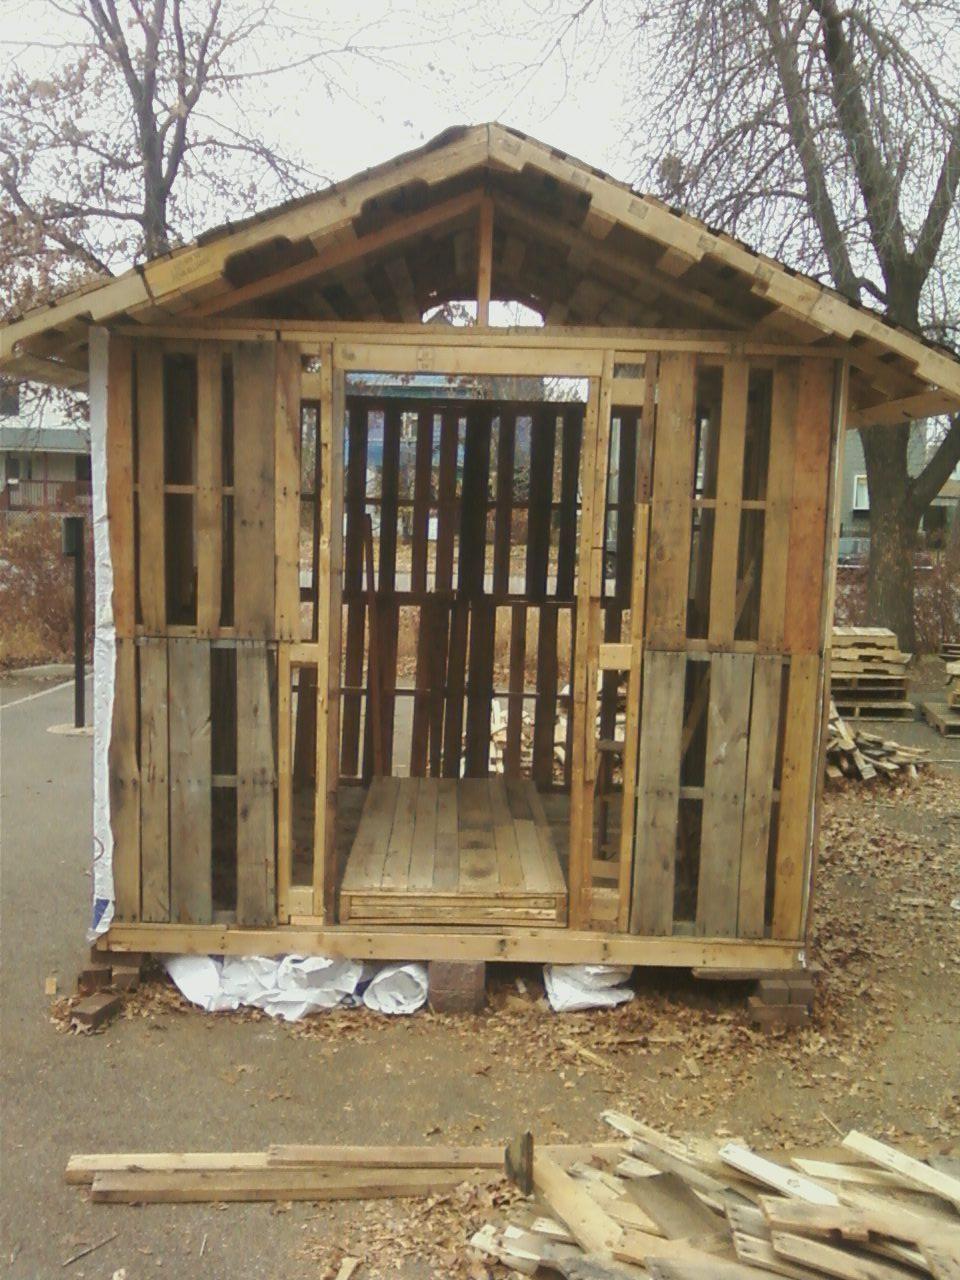 roof finished. super suprised it wasn't sagging. built the